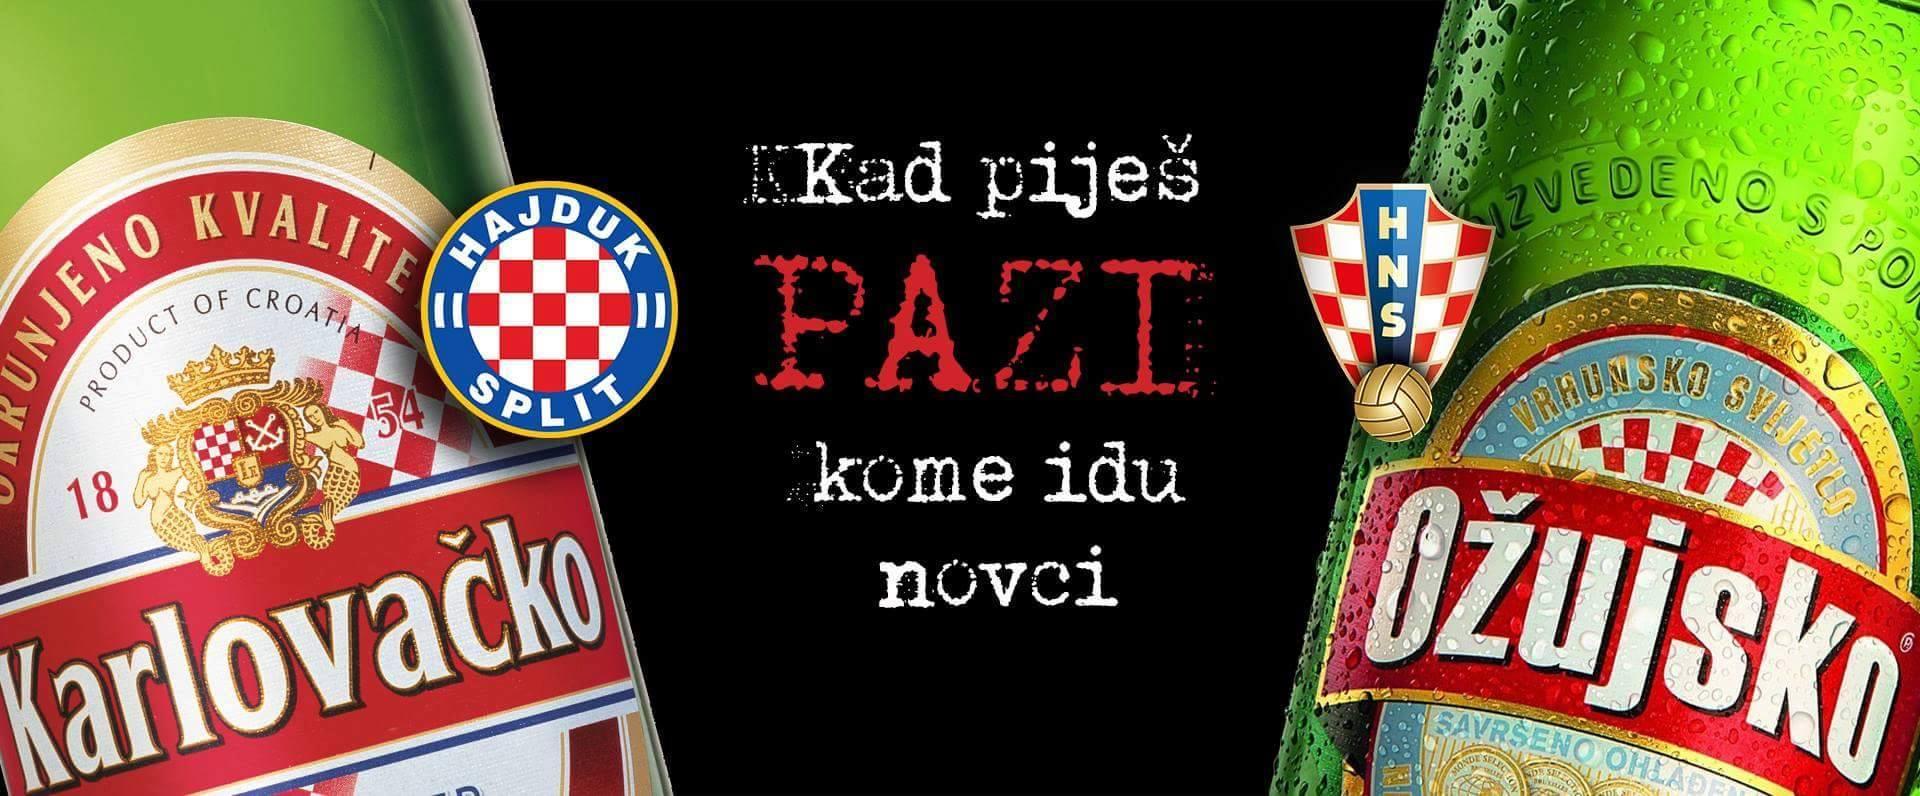 Hajducki proizvodi